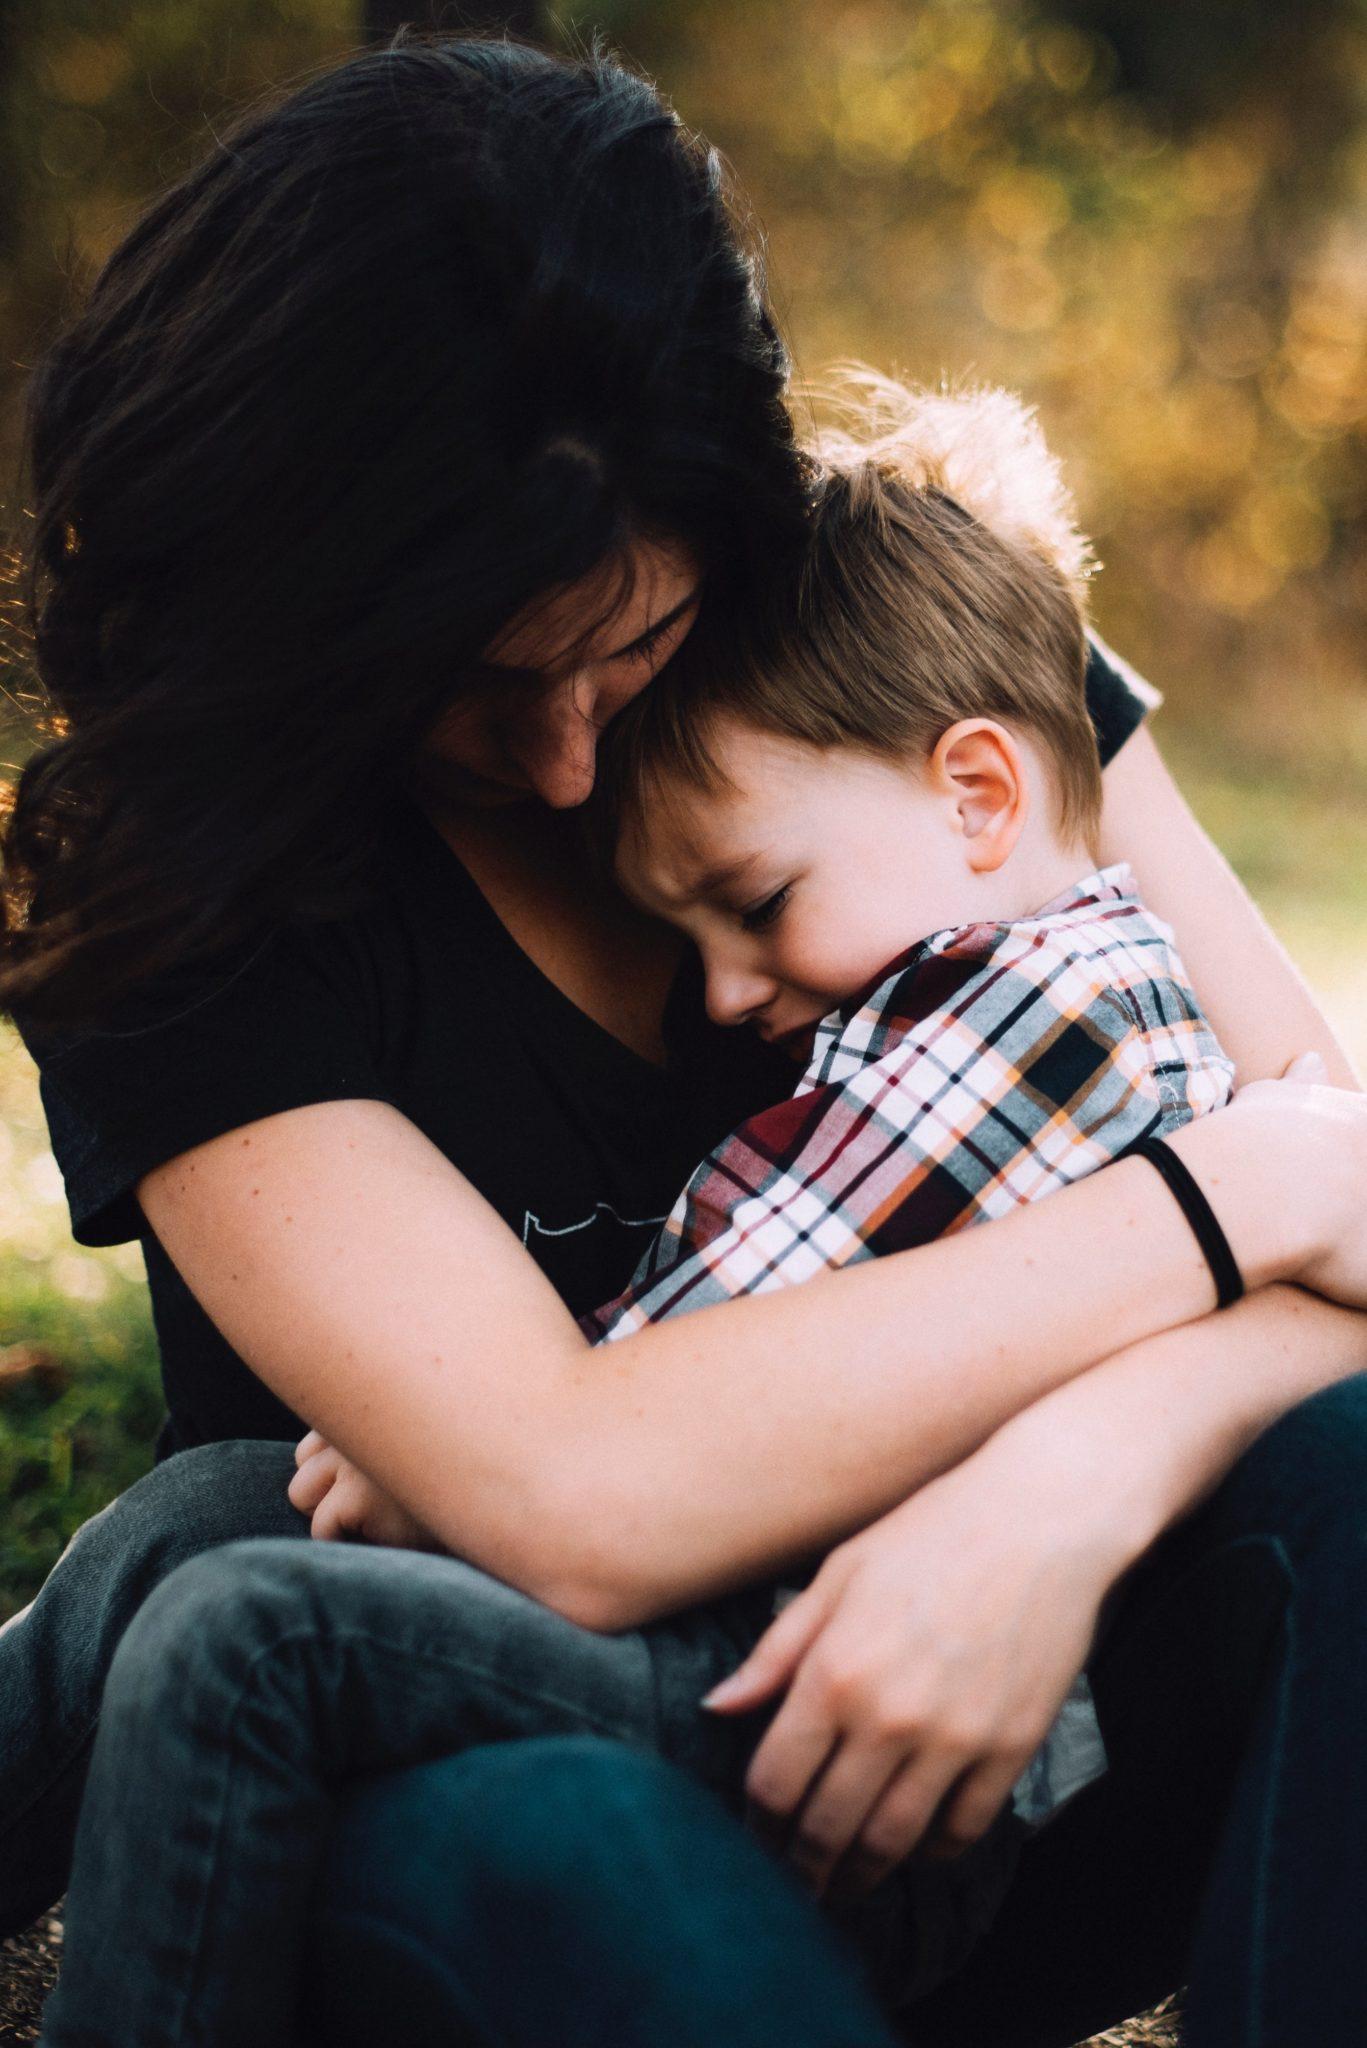 mom holding upset child